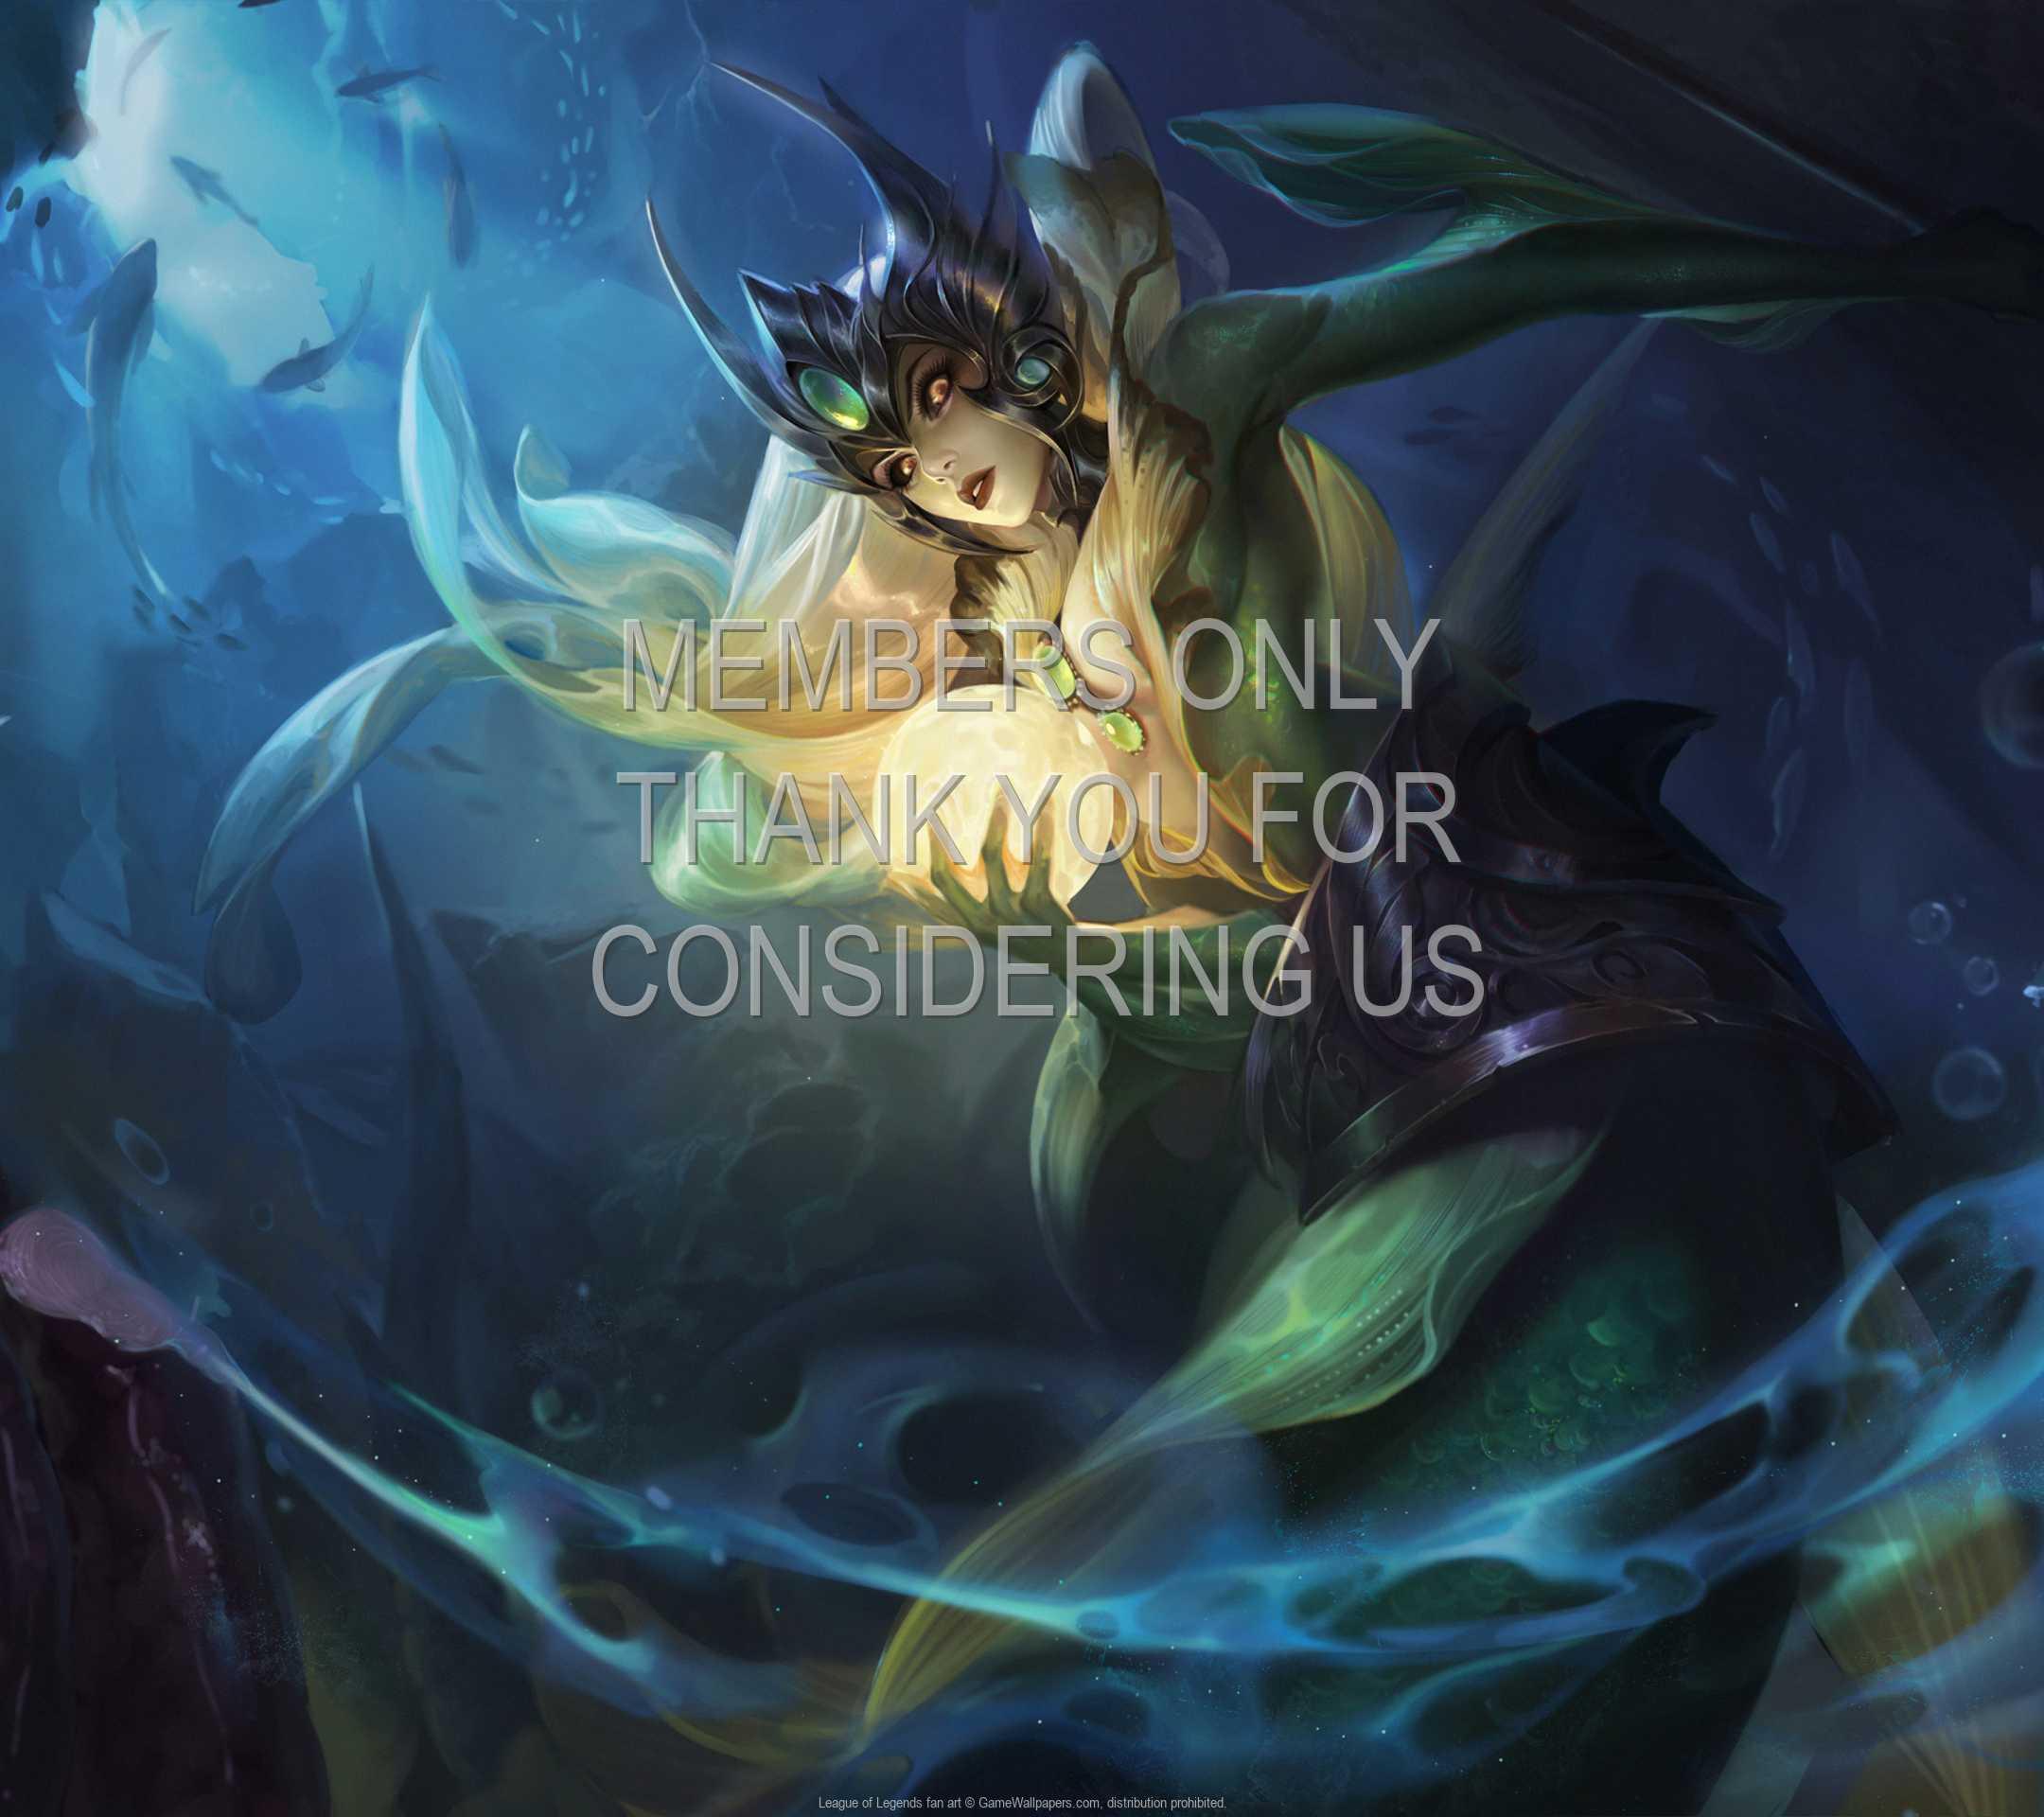 League of Legends fan art 1080p Horizontal Mobile wallpaper or background 18